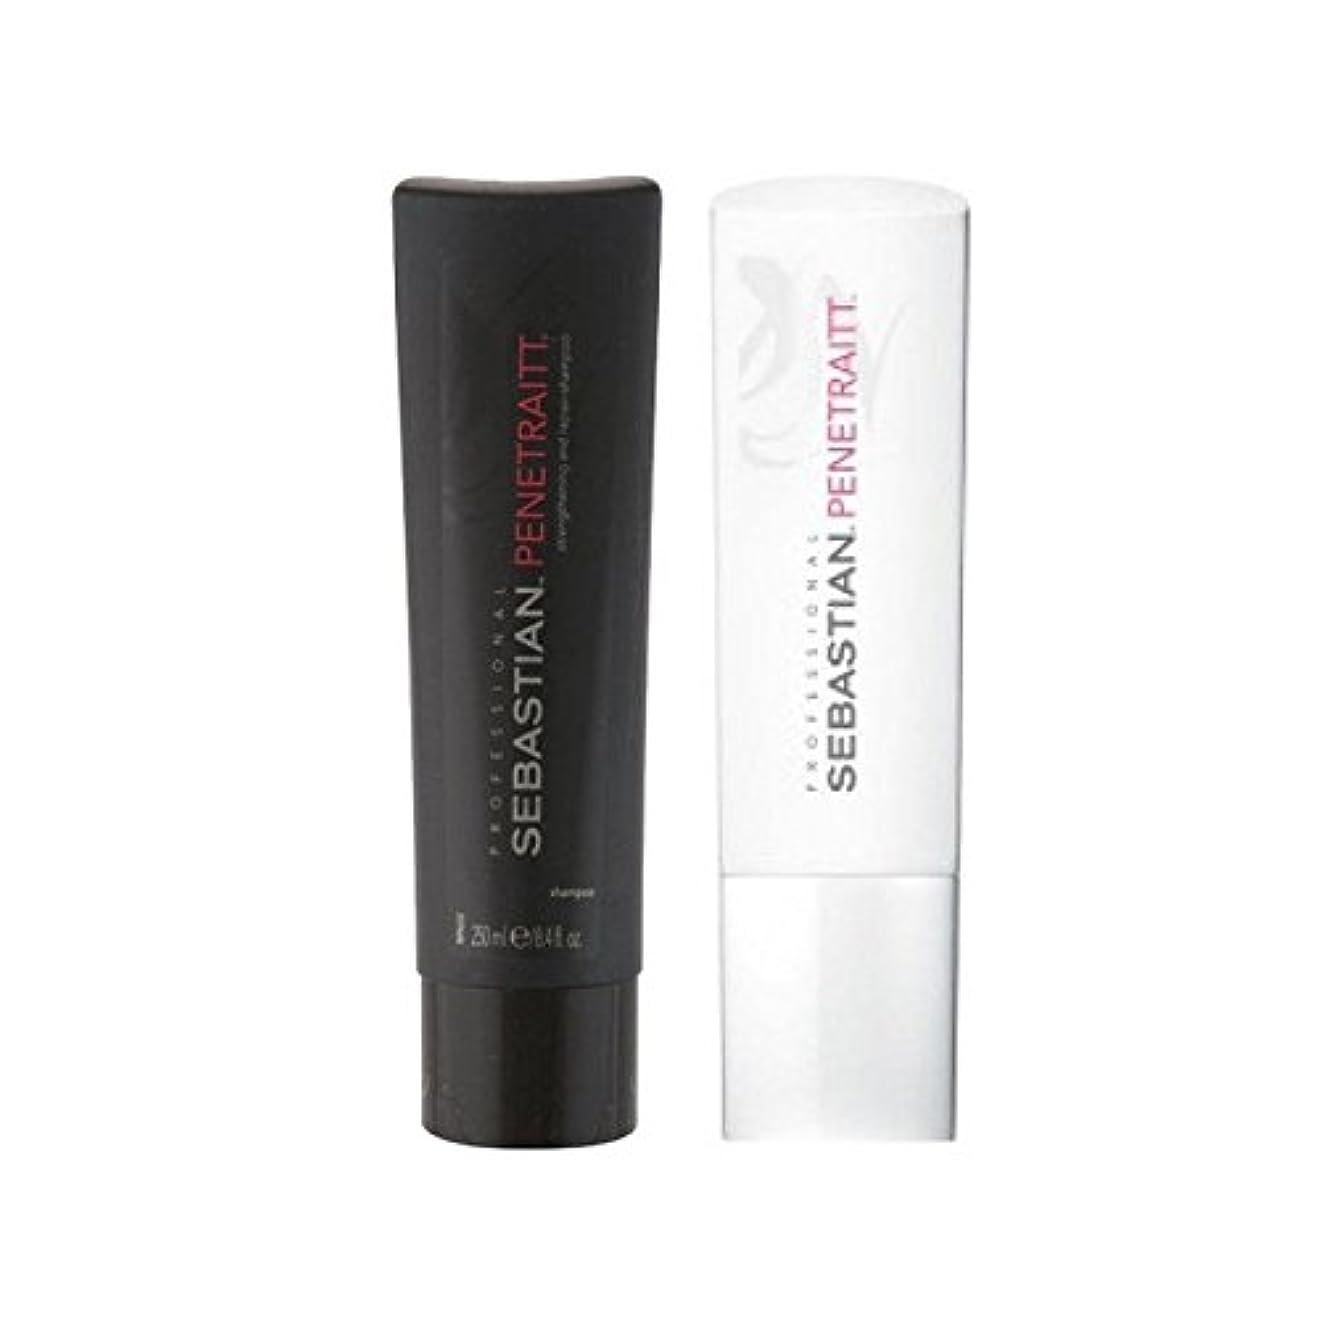 Sebastian Professional Penetraitt Duo - Shampoo & Conditioner (Pack of 6) - セバスチャンプロデュオ - シャンプー&コンディショナー x6 [並行輸入品]